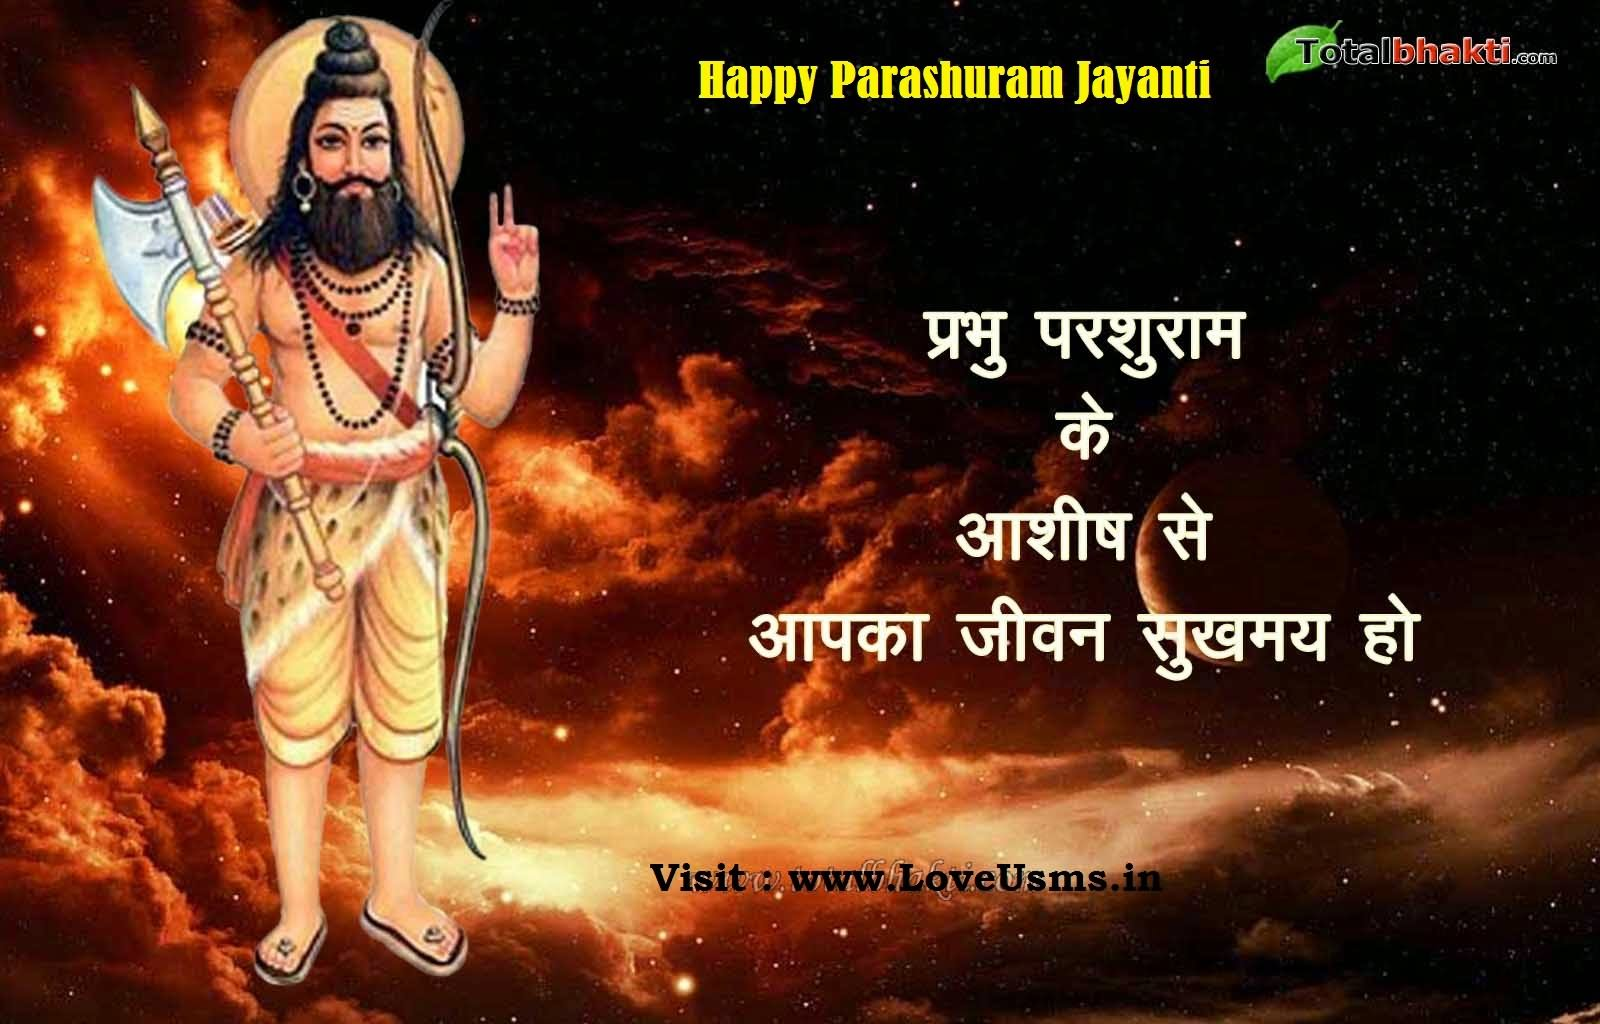 about parshuram jayanti